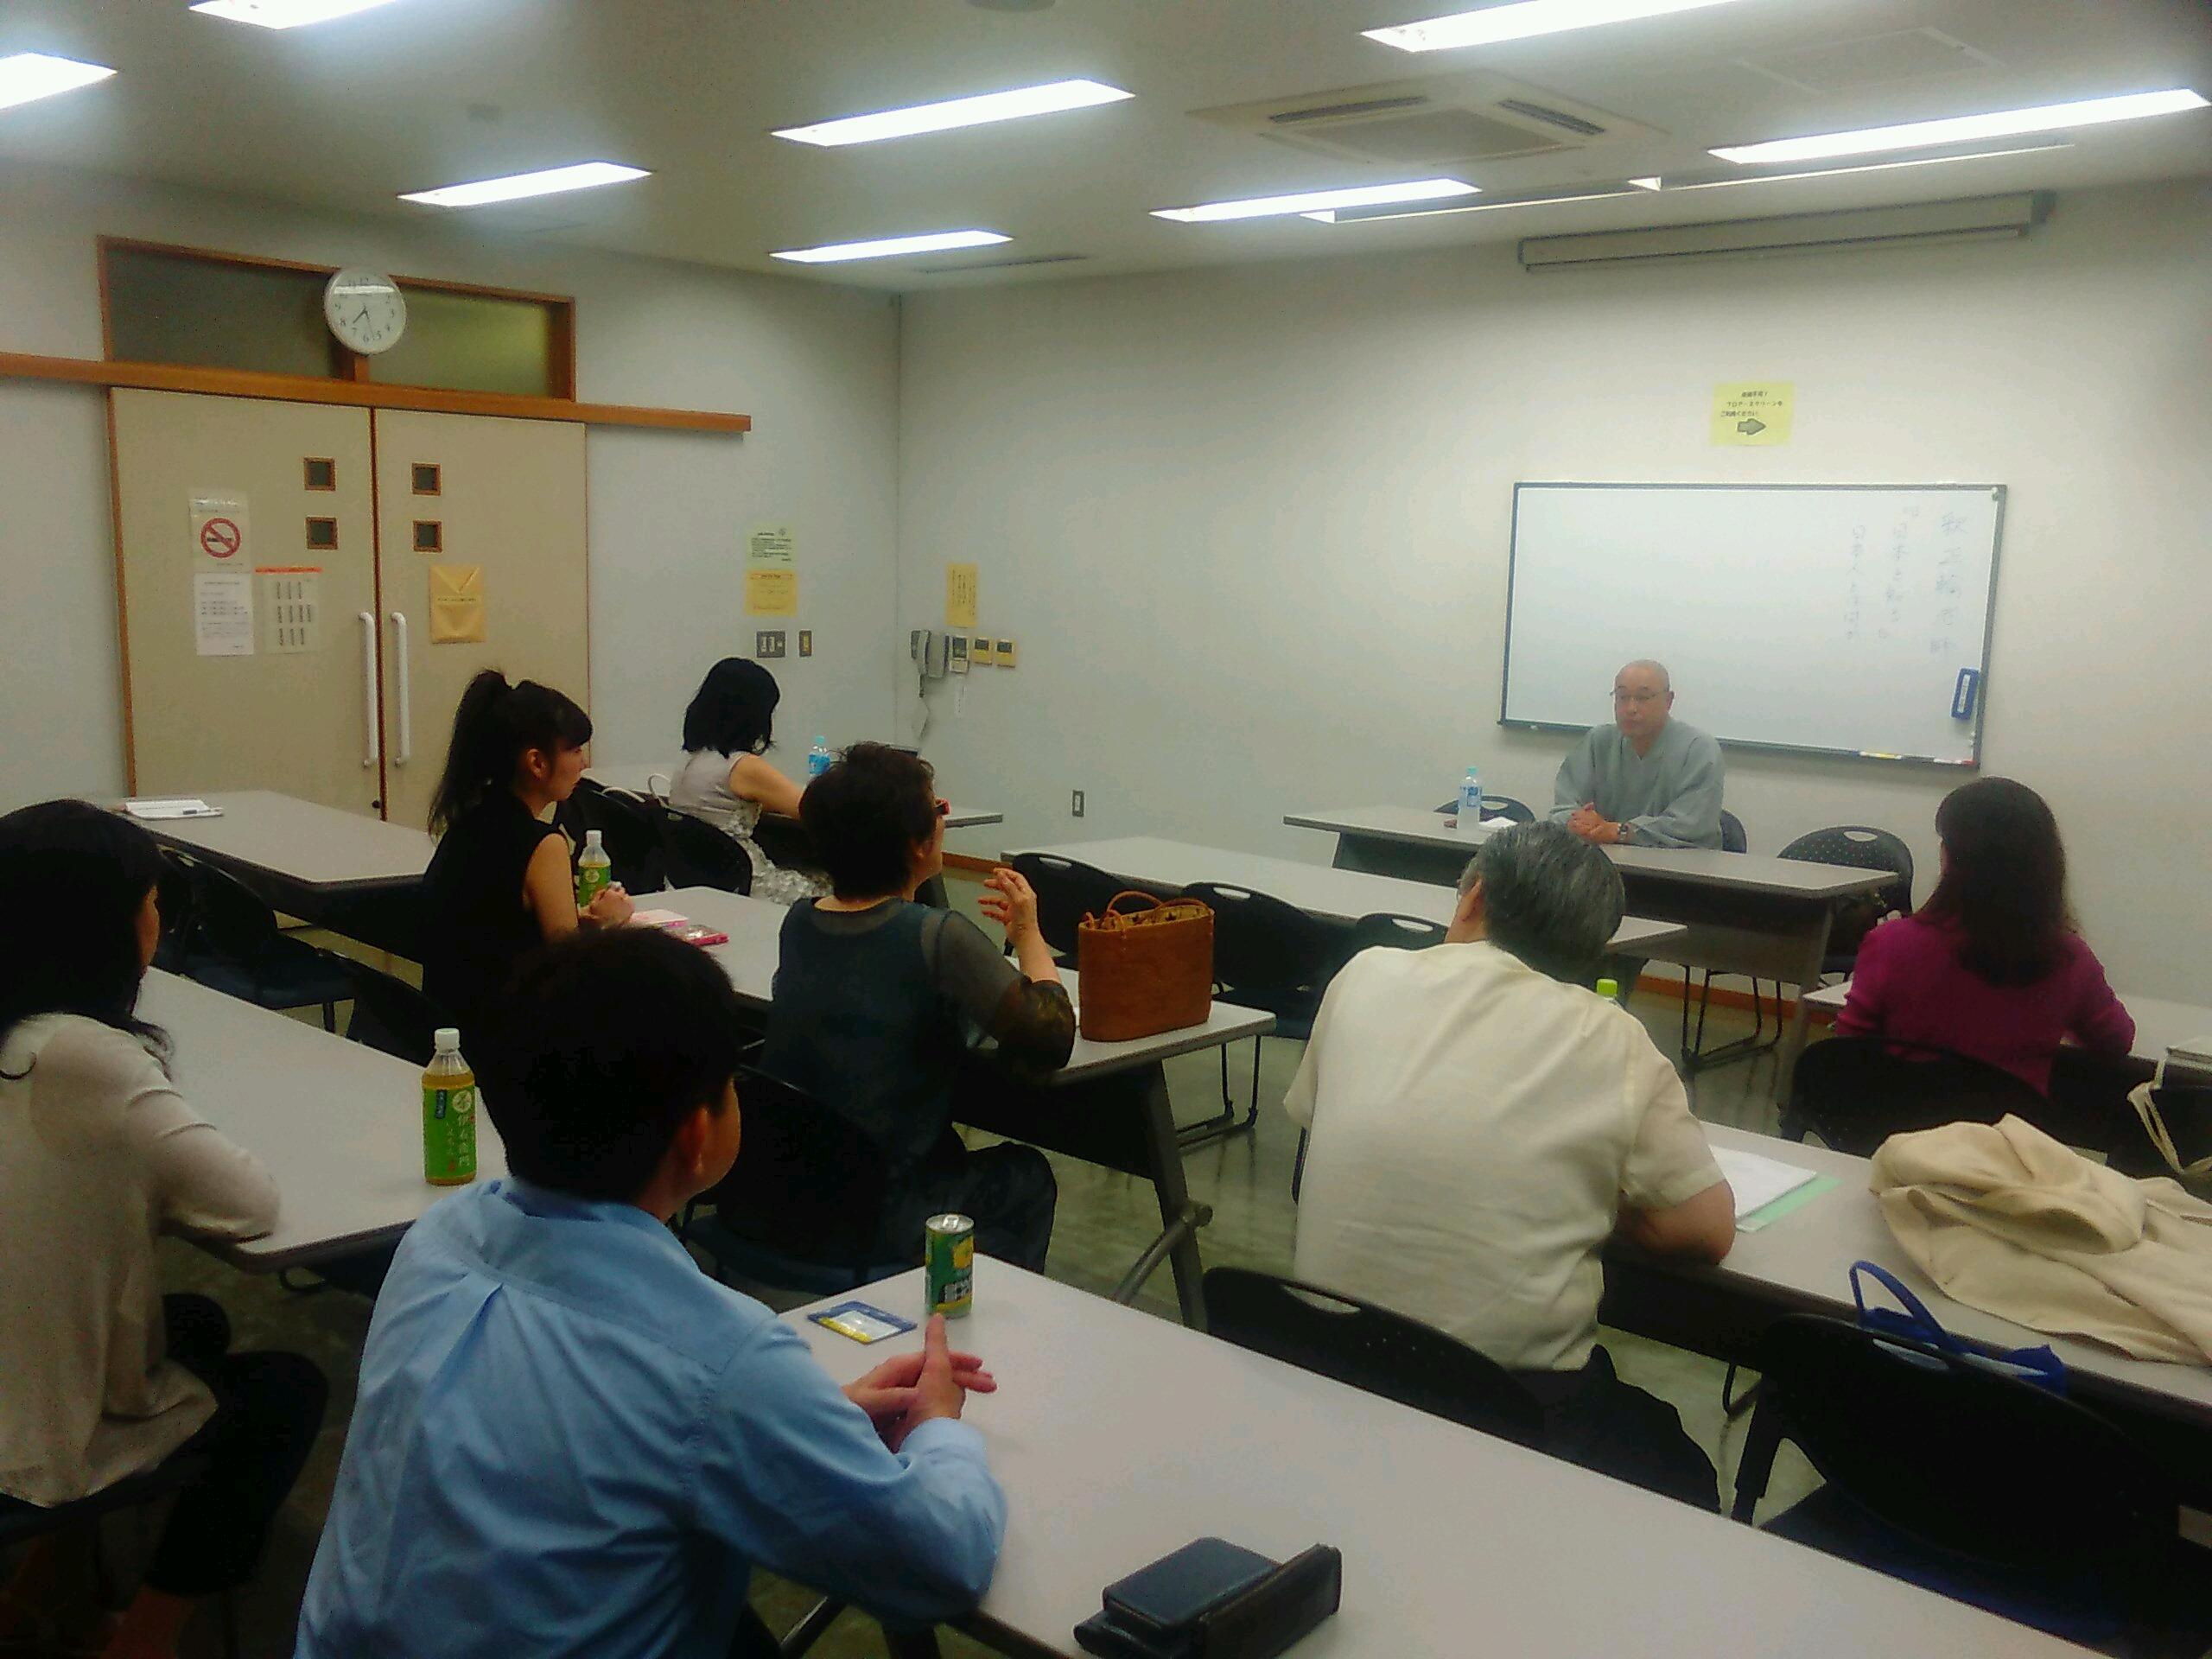 20180809192733 - 大阪開催リニューアル 第1回釈正輪老大師 講話会